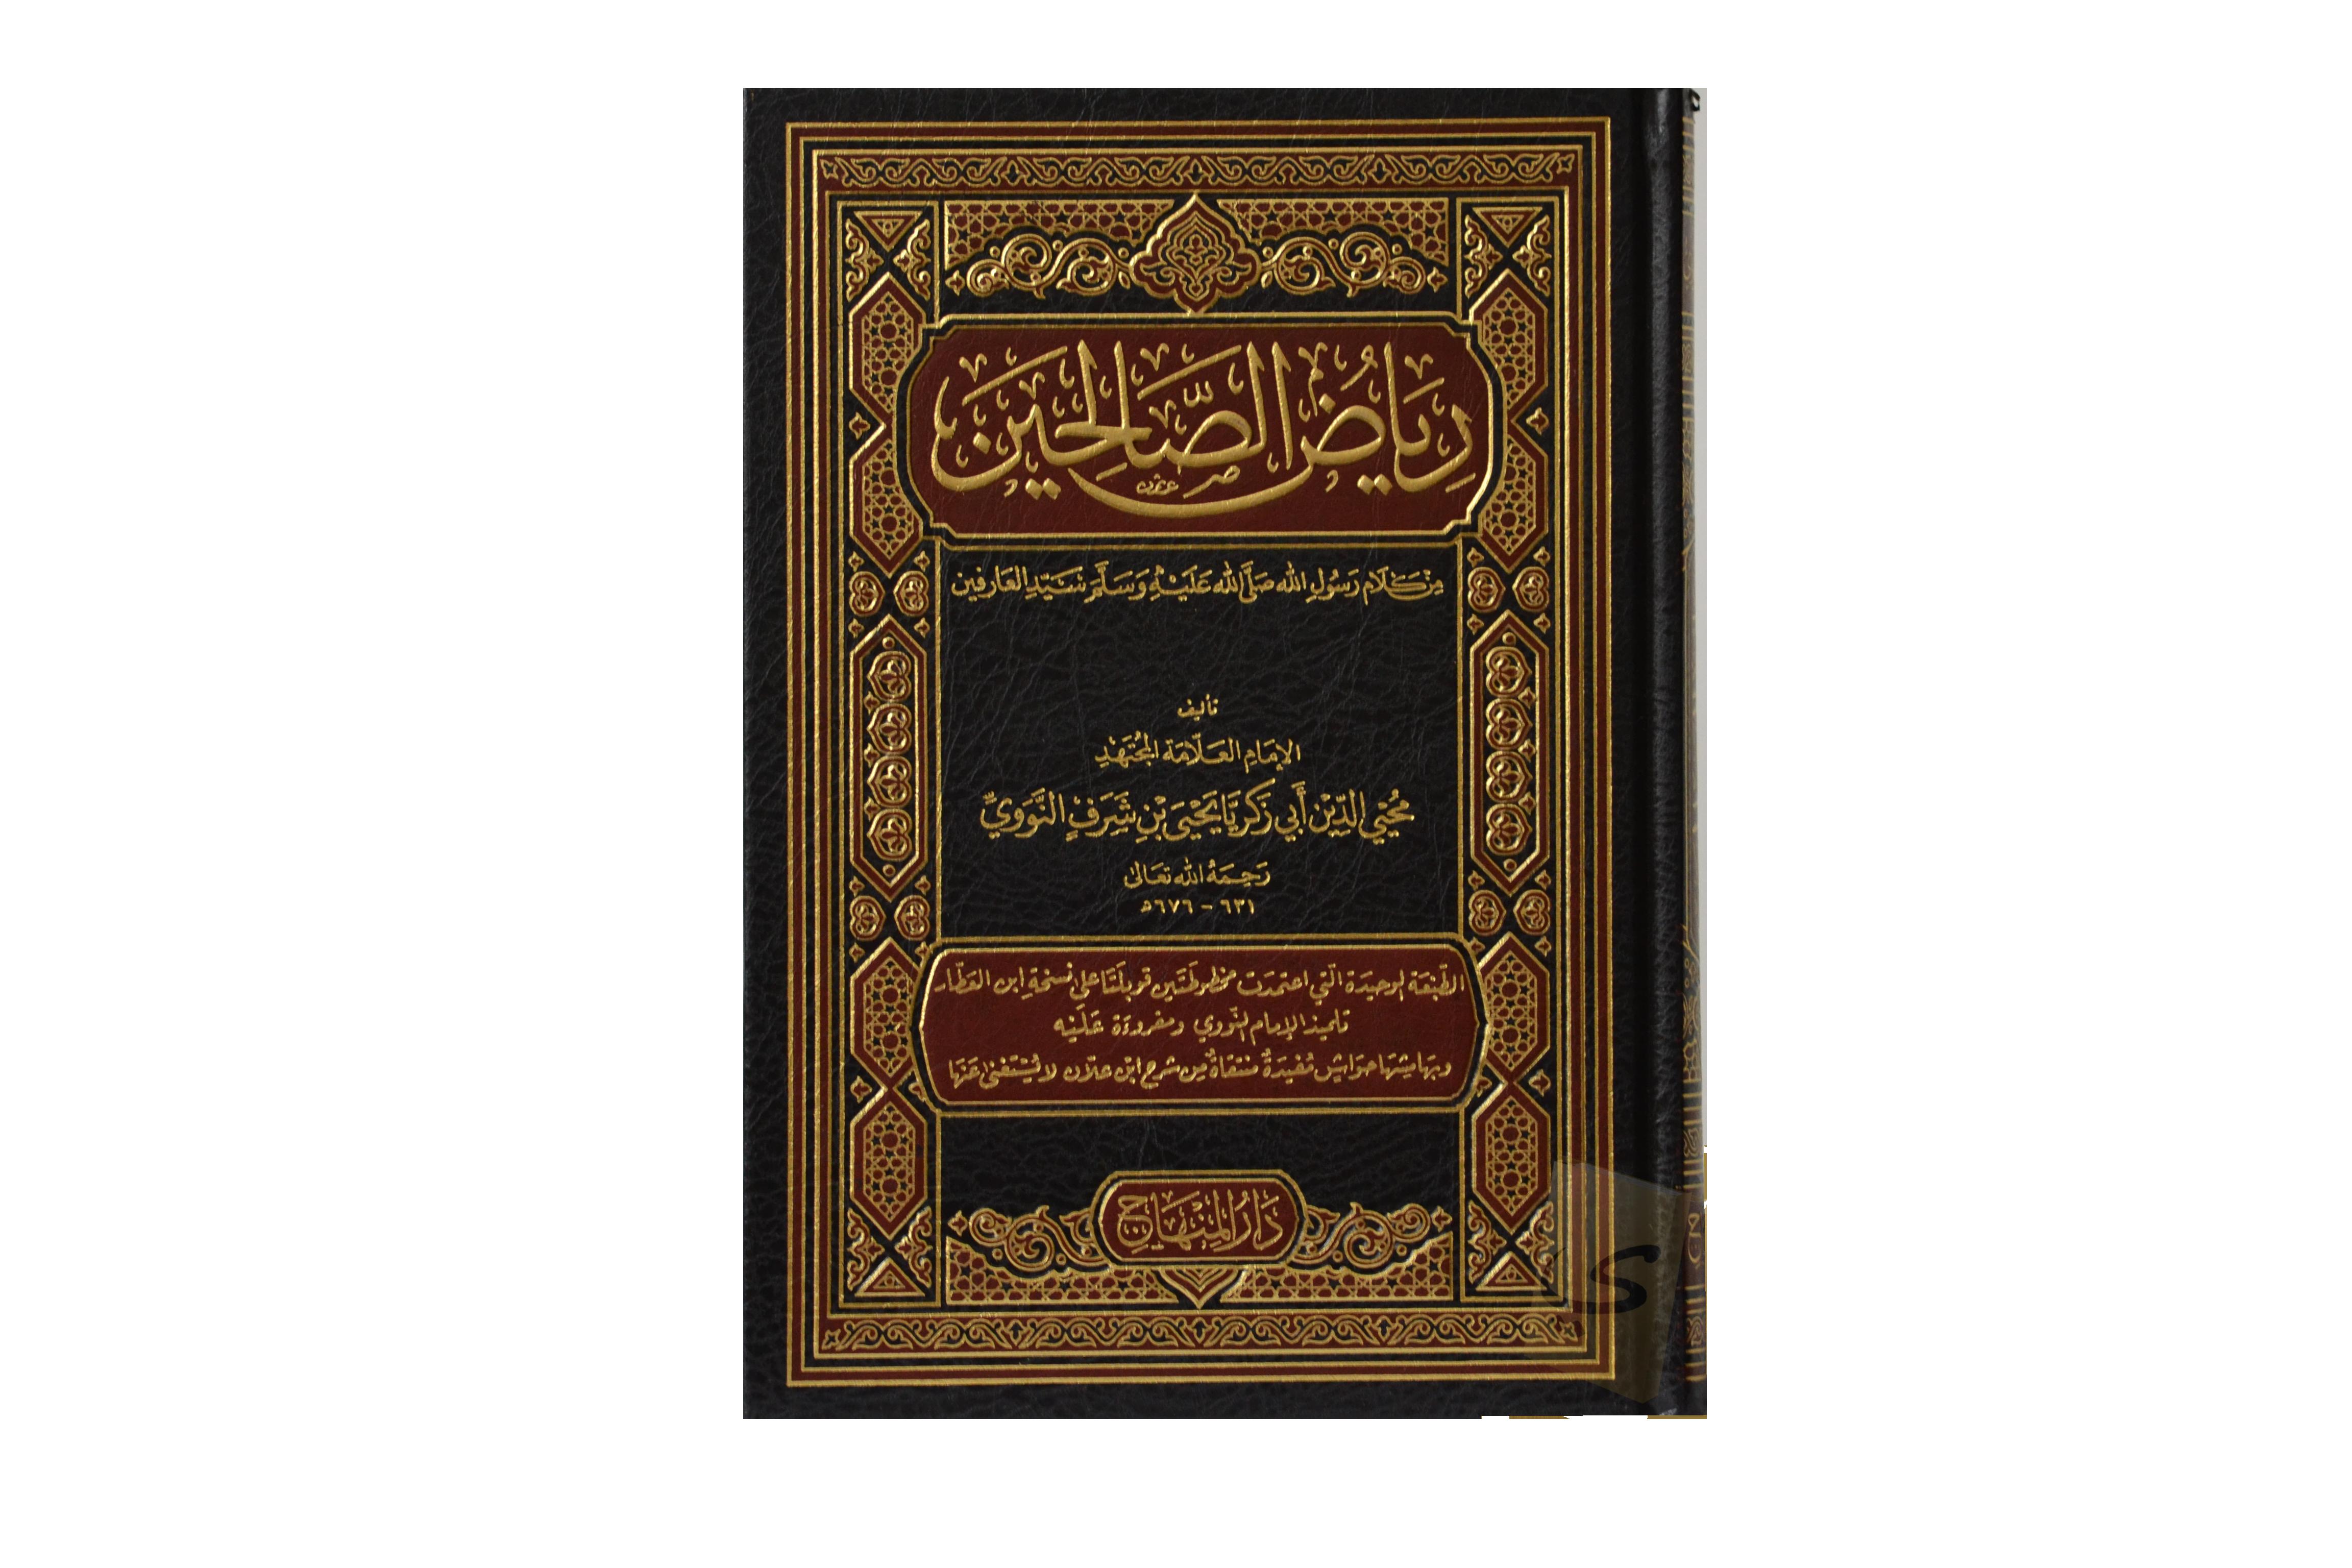 Riyad as-Saliheen